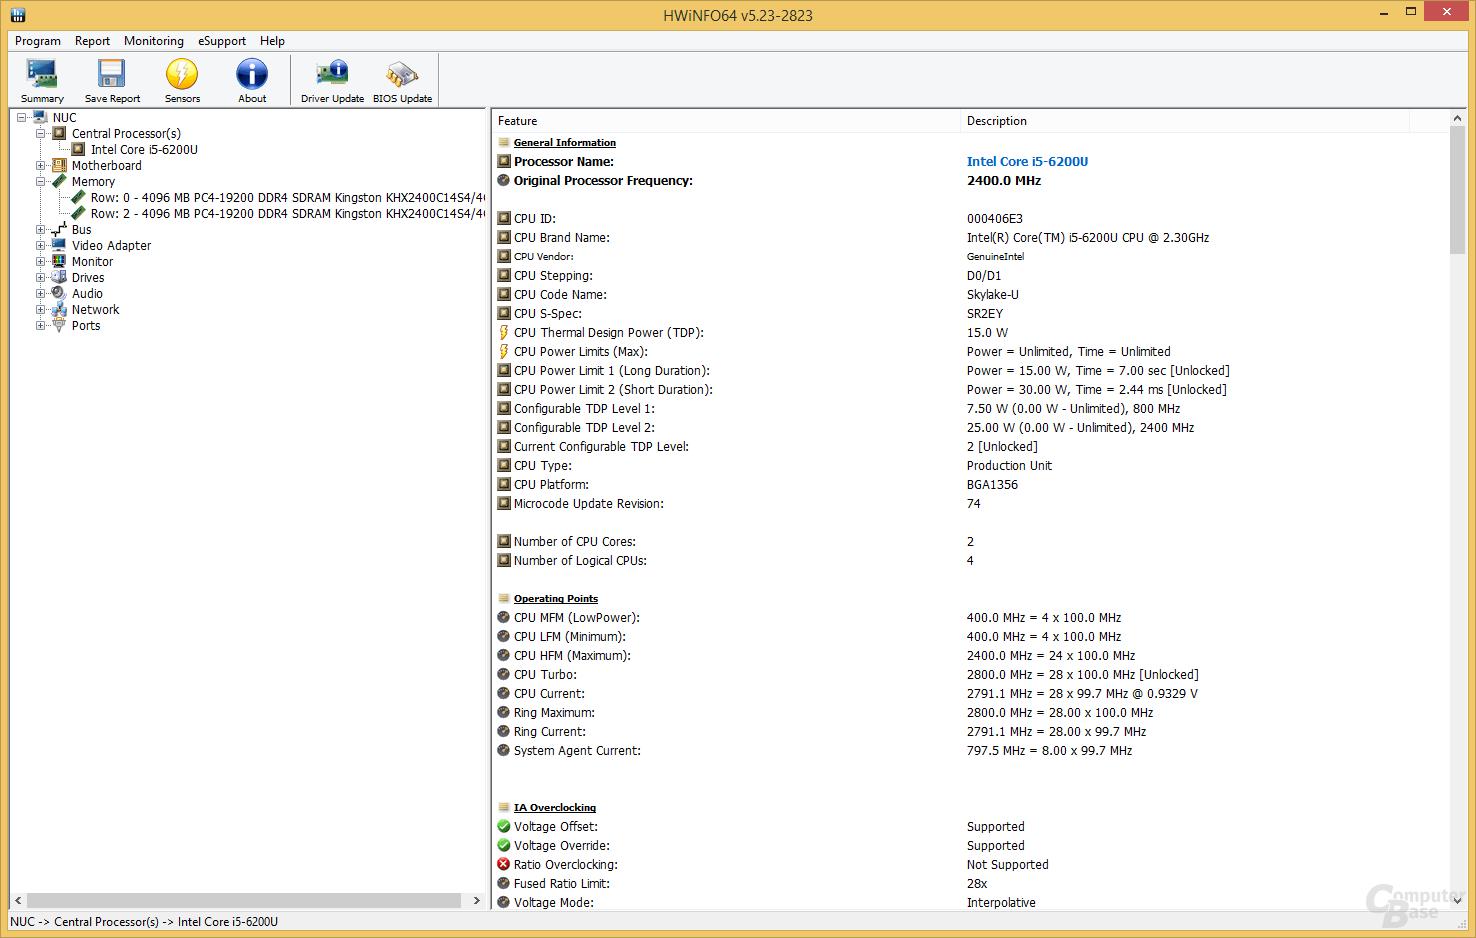 Intel Core i5-6200U im Brix nie unter 2.400 MHz